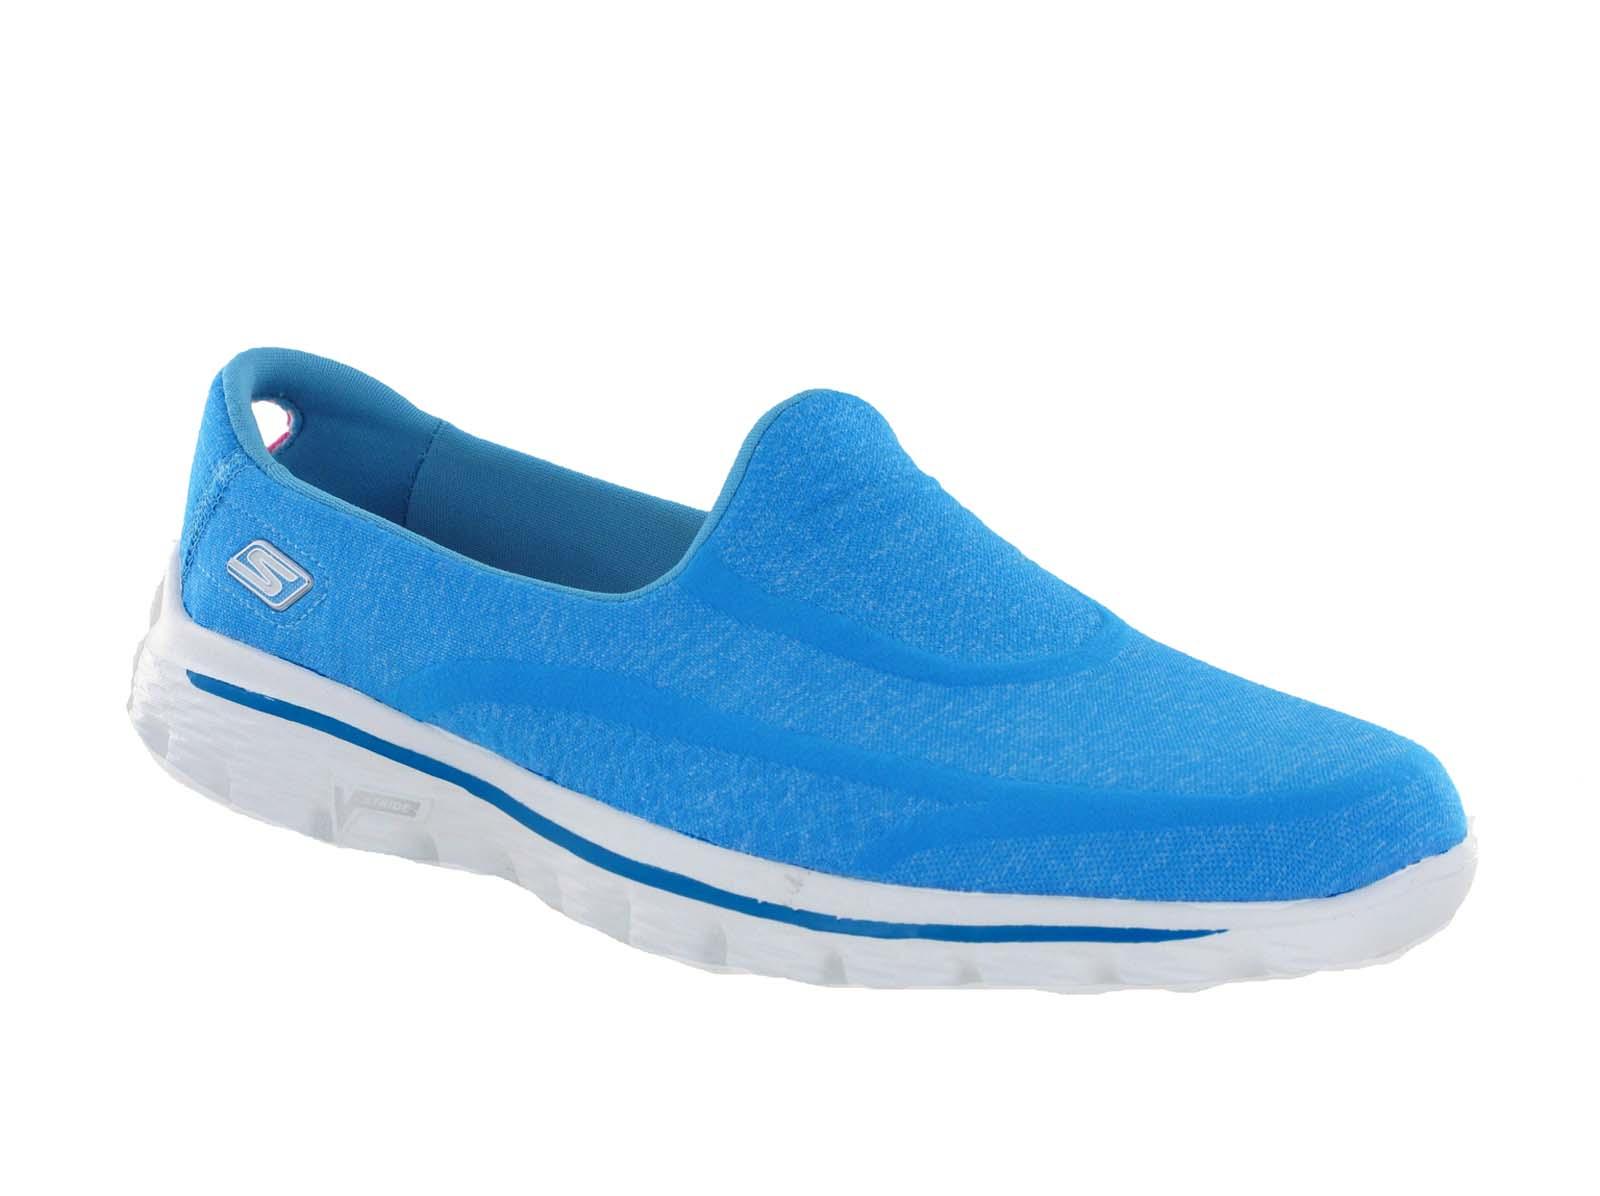 New-Womens-Skechers-Go-Walk-2-Super-Sock-